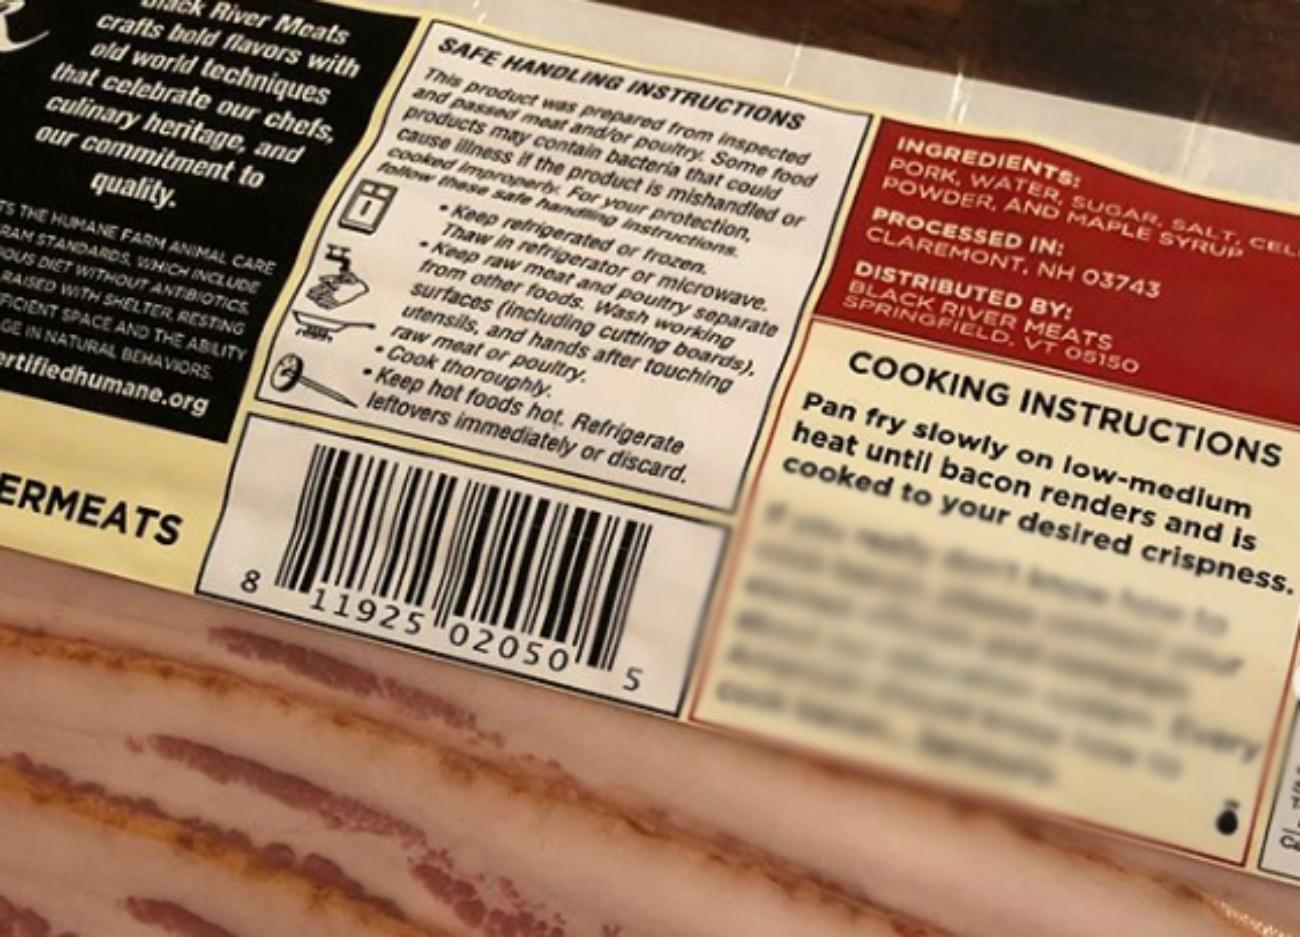 Blurred Black River meats